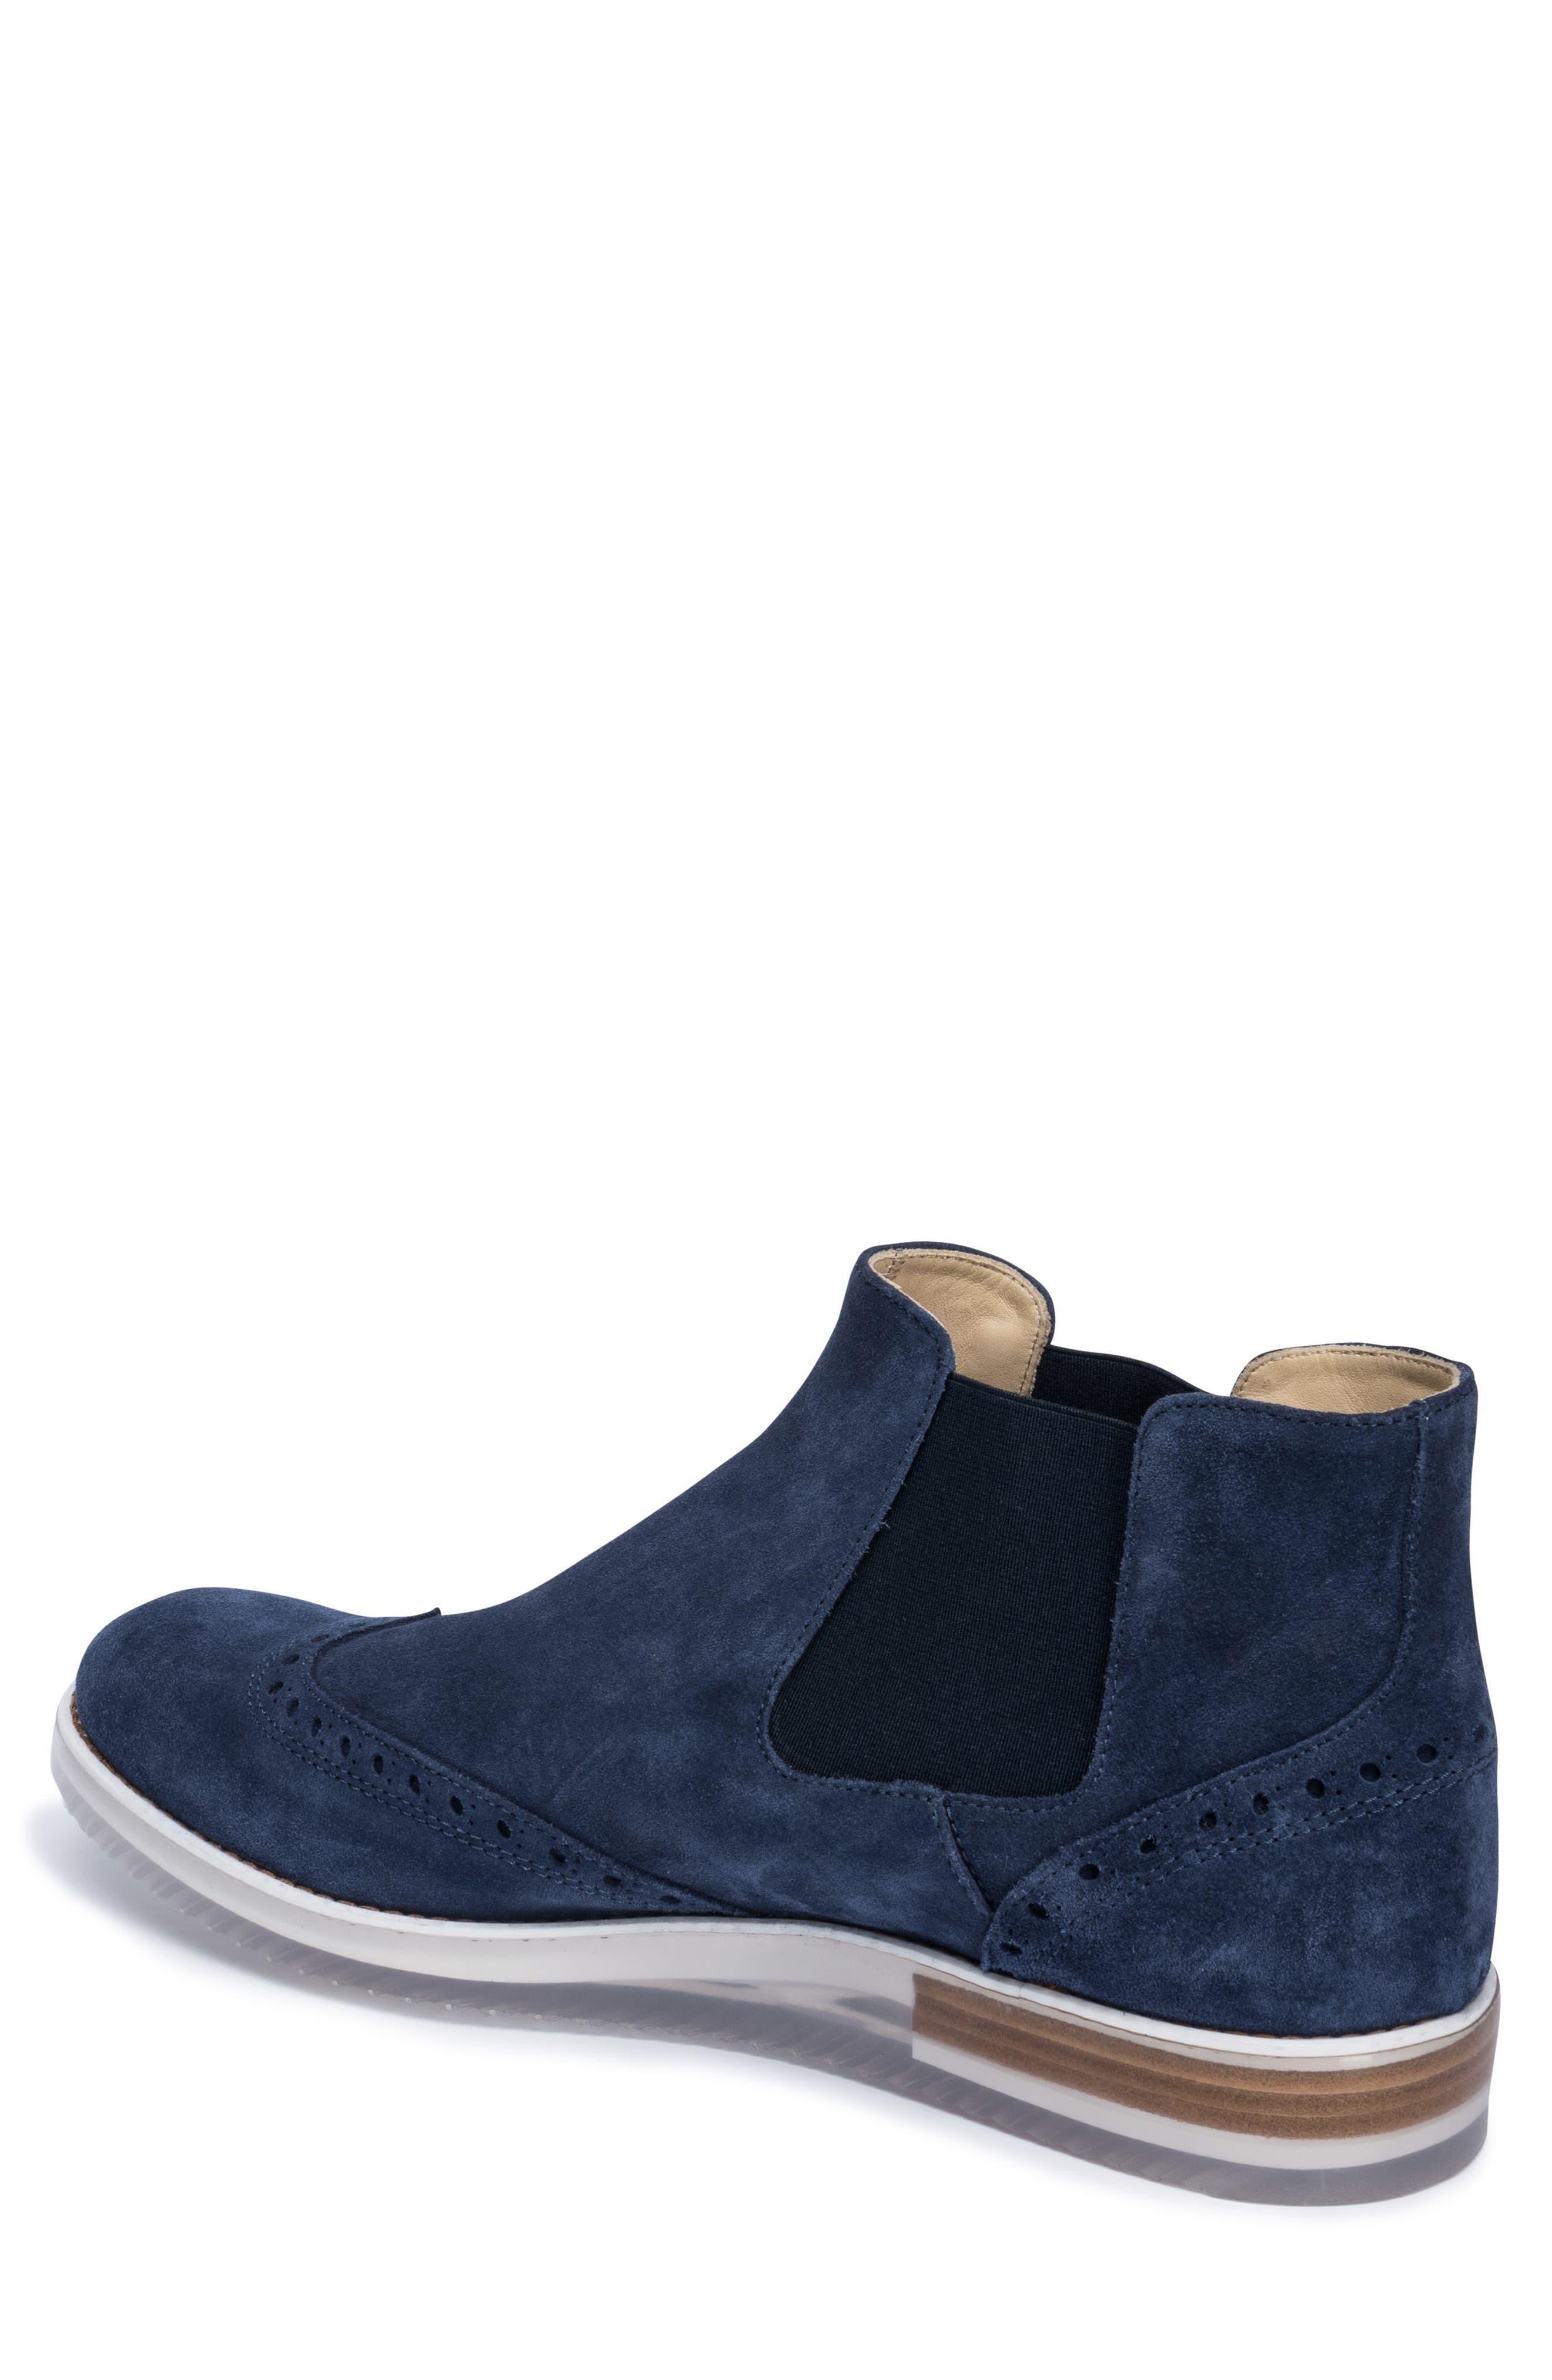 Brescia Mid Chelsea Wingtip Sneaker Boot,                             Alternate thumbnail 2, color,                             429